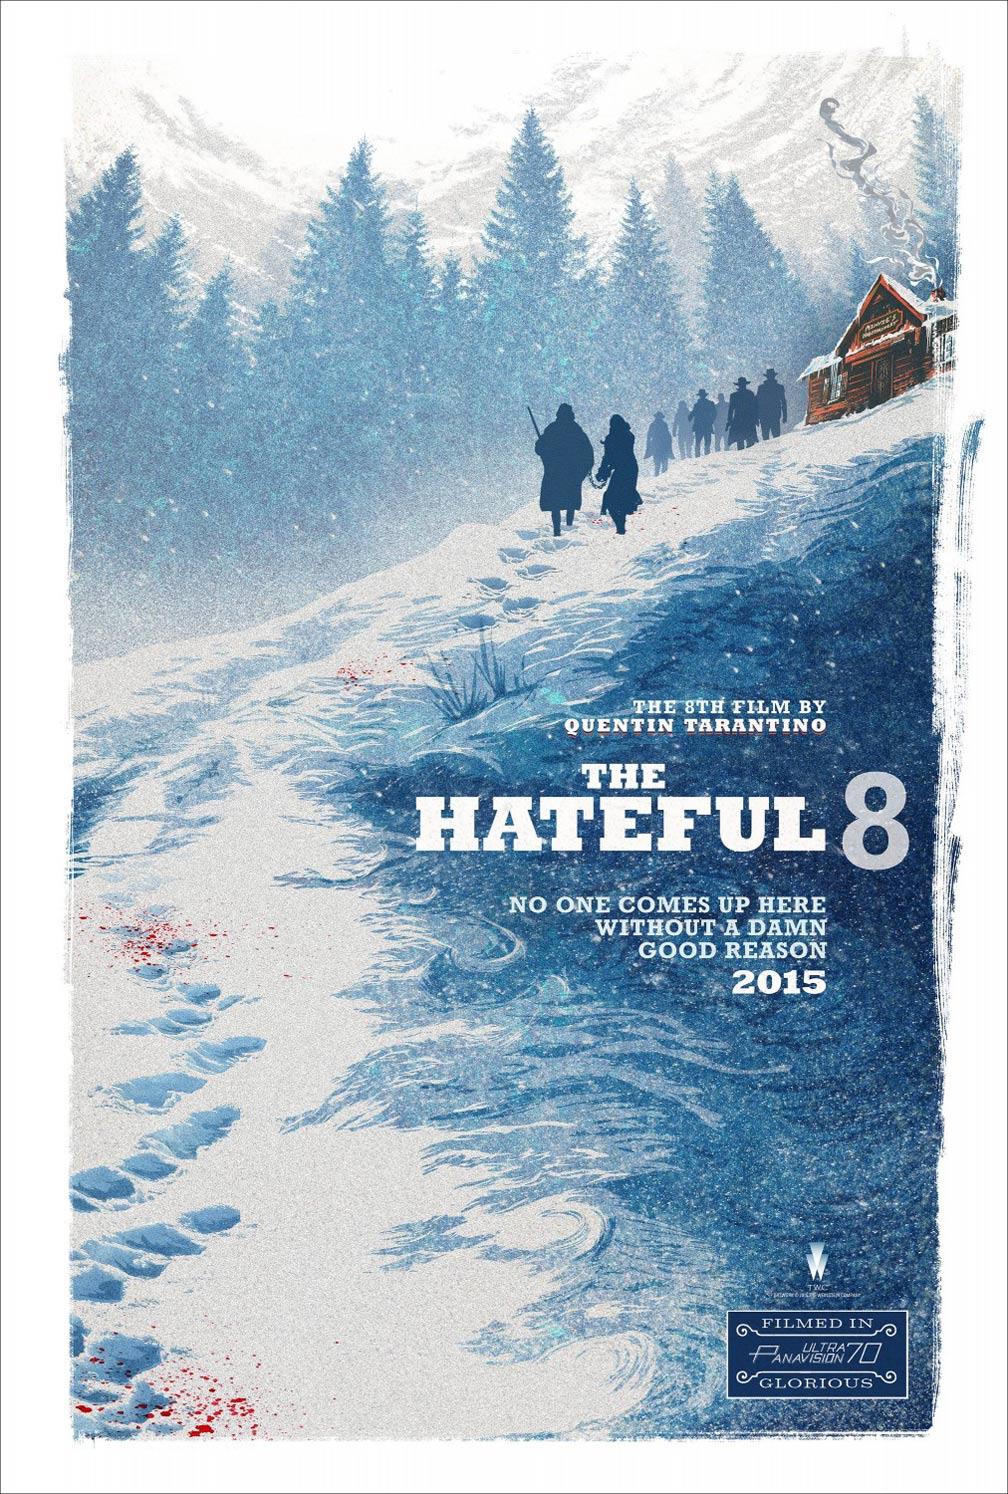 Hatefull 8